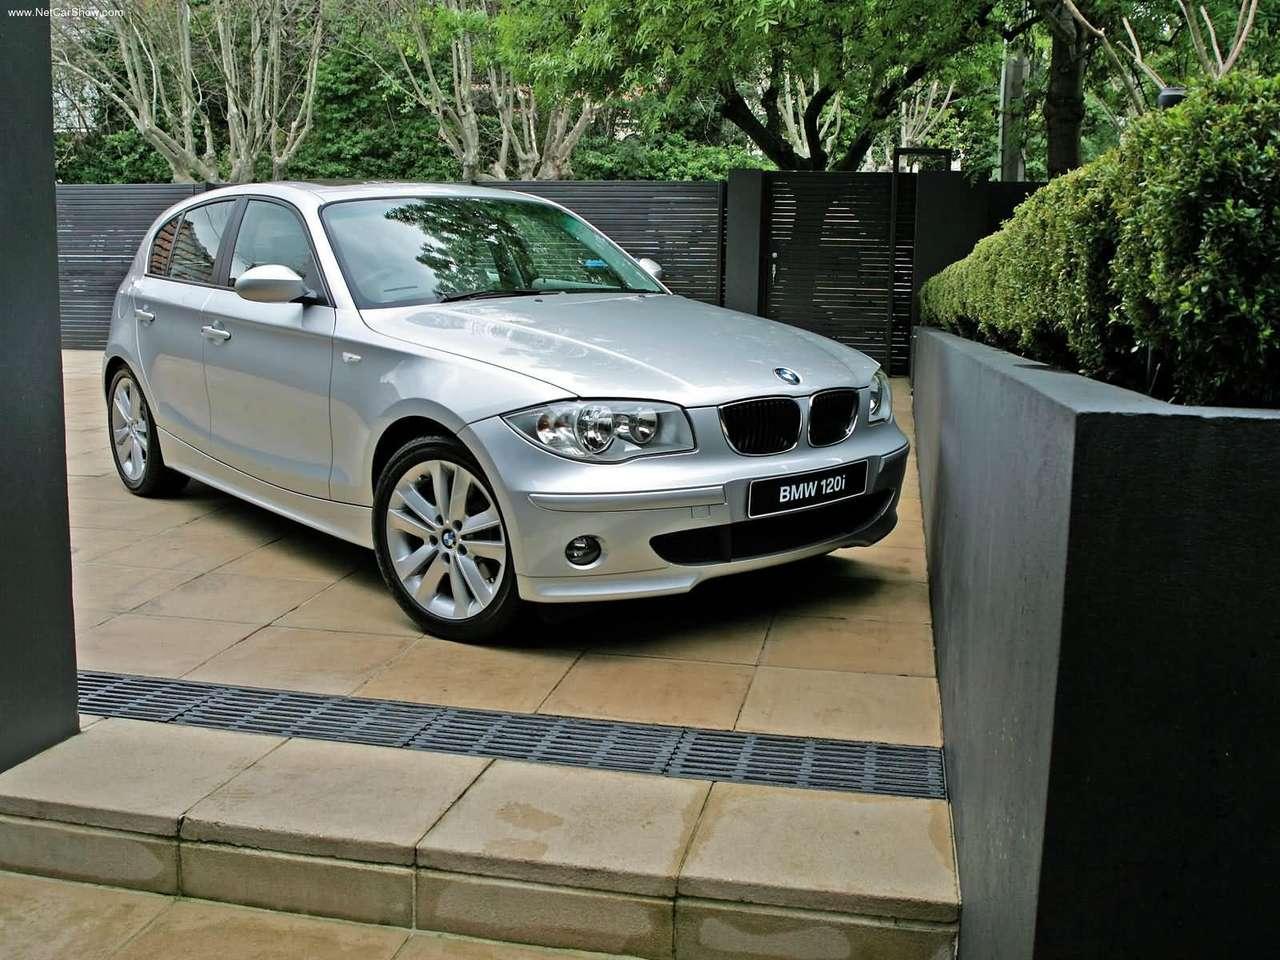 http://1.bp.blogspot.com/_vPMjJG-enrk/TAqNK3_V78I/AAAAAAAACrE/8yvcMC7U_AY/s1600/BMW-120i_UK_Version_2005_1280x960_wallpaper_01.jpg